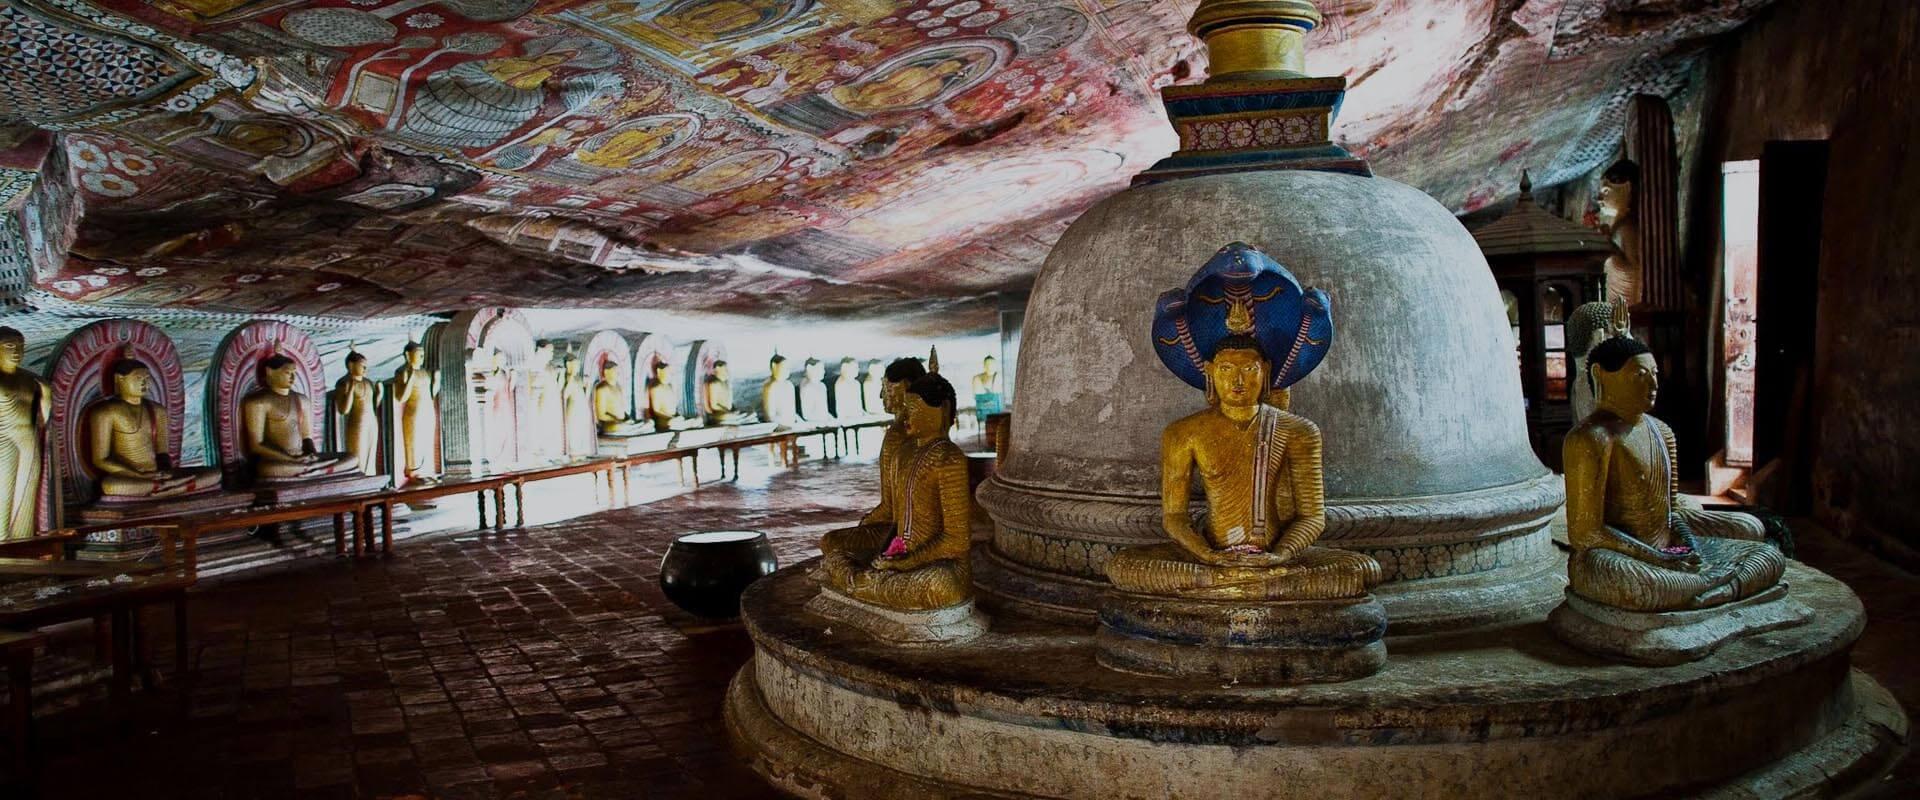 Sigiriya Rock Fortress and Dambulla Cave Temple